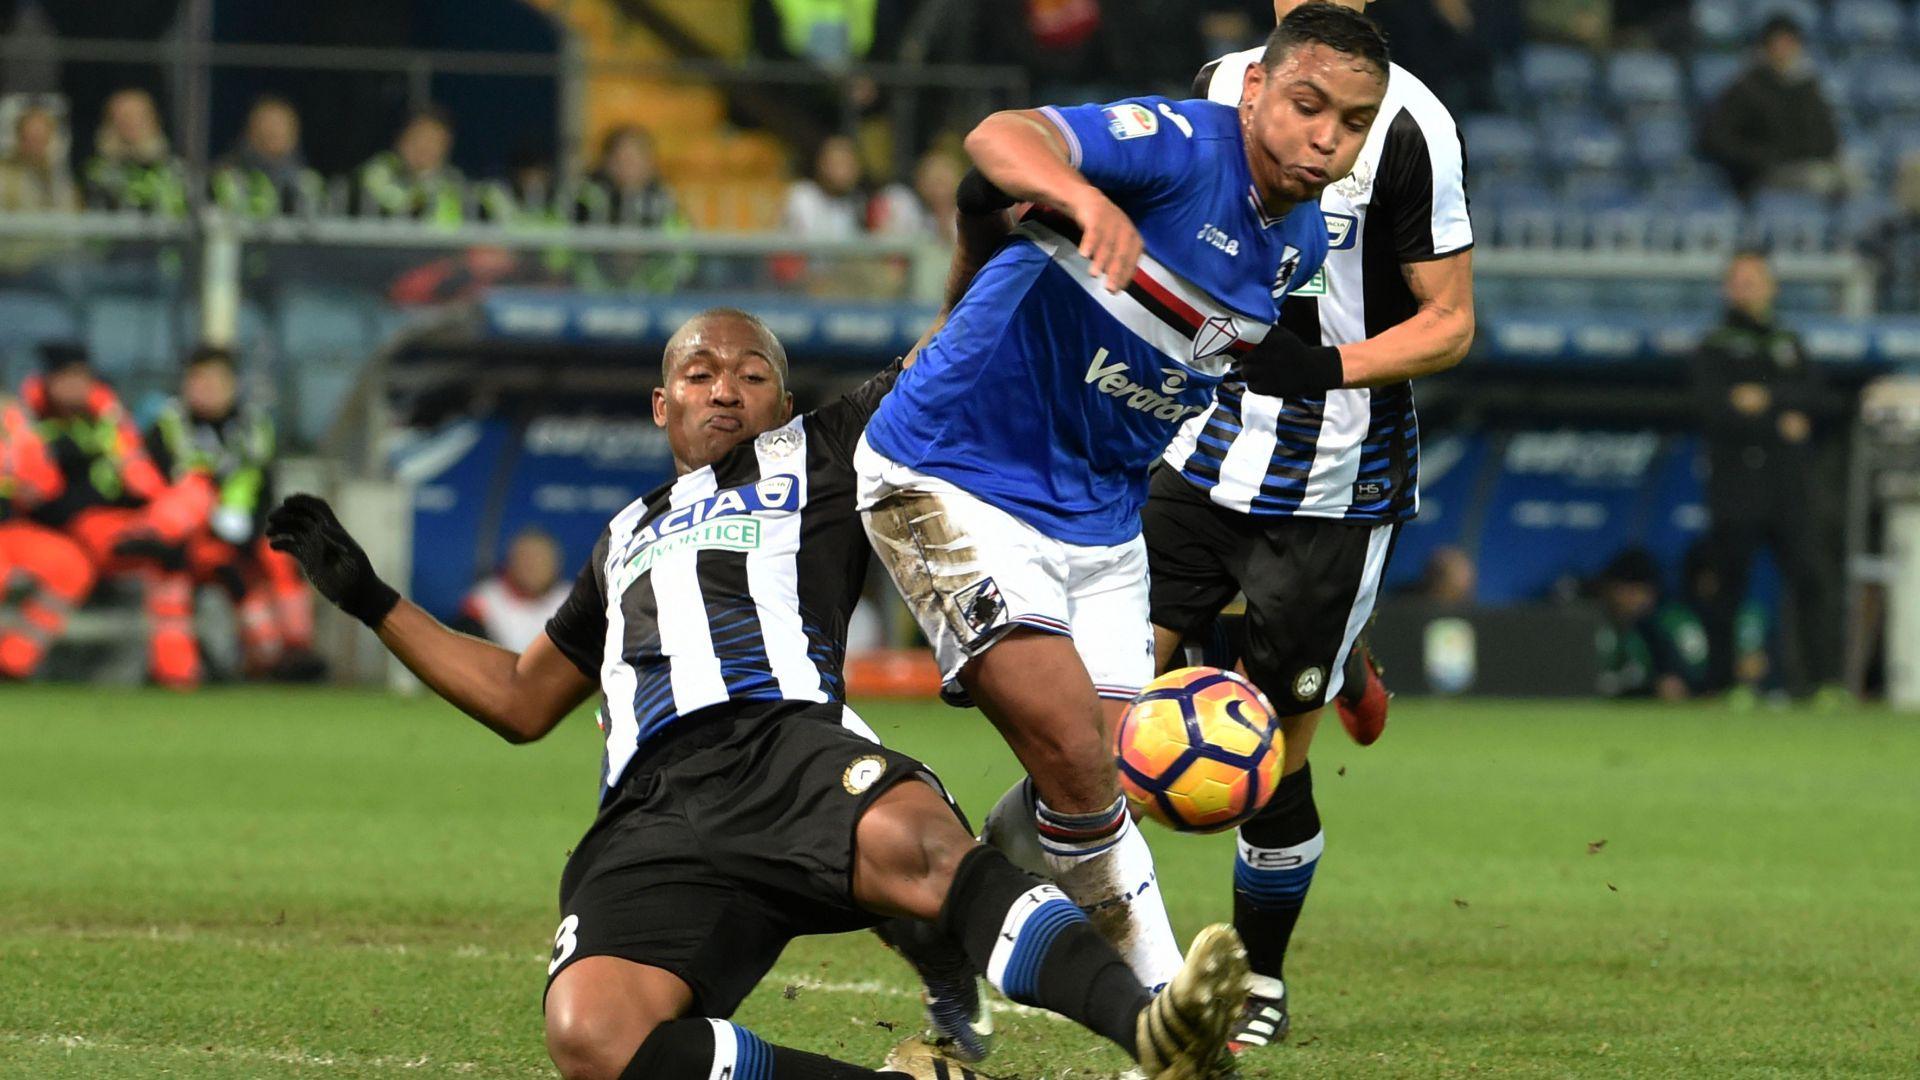 Udinese-Sampdoria, le formazioni ufficiali: Muriel titolare, Thereau c'è